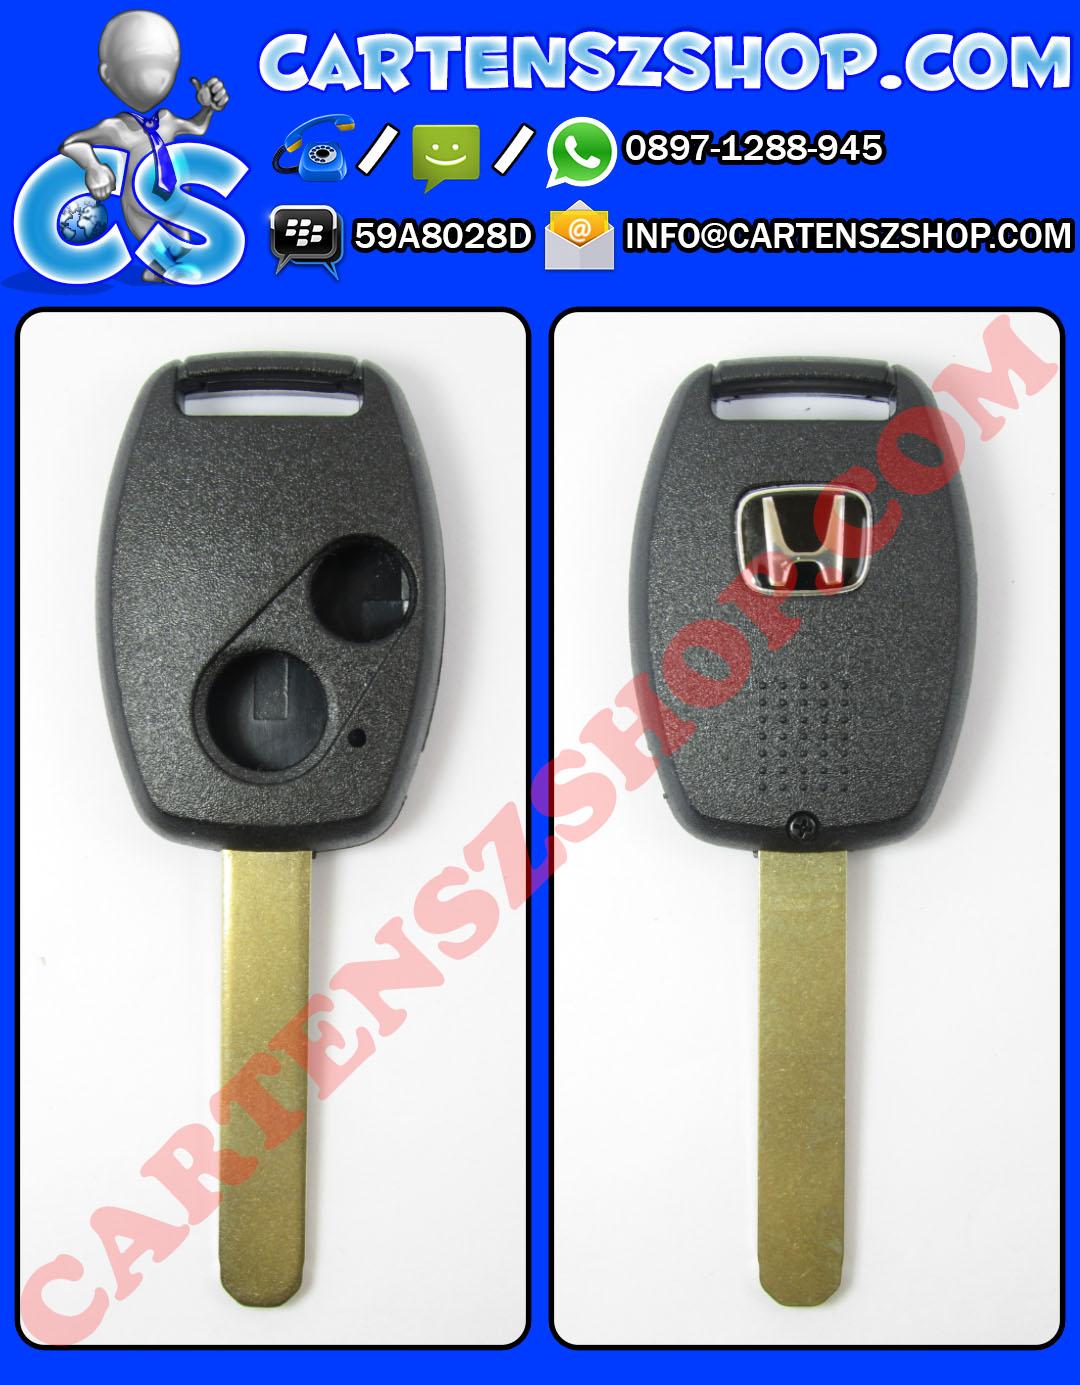 Casing Kunci 2 Tombol Mobil Honda Mobilio, Brio, Jazz, CRV, Civic, Dll